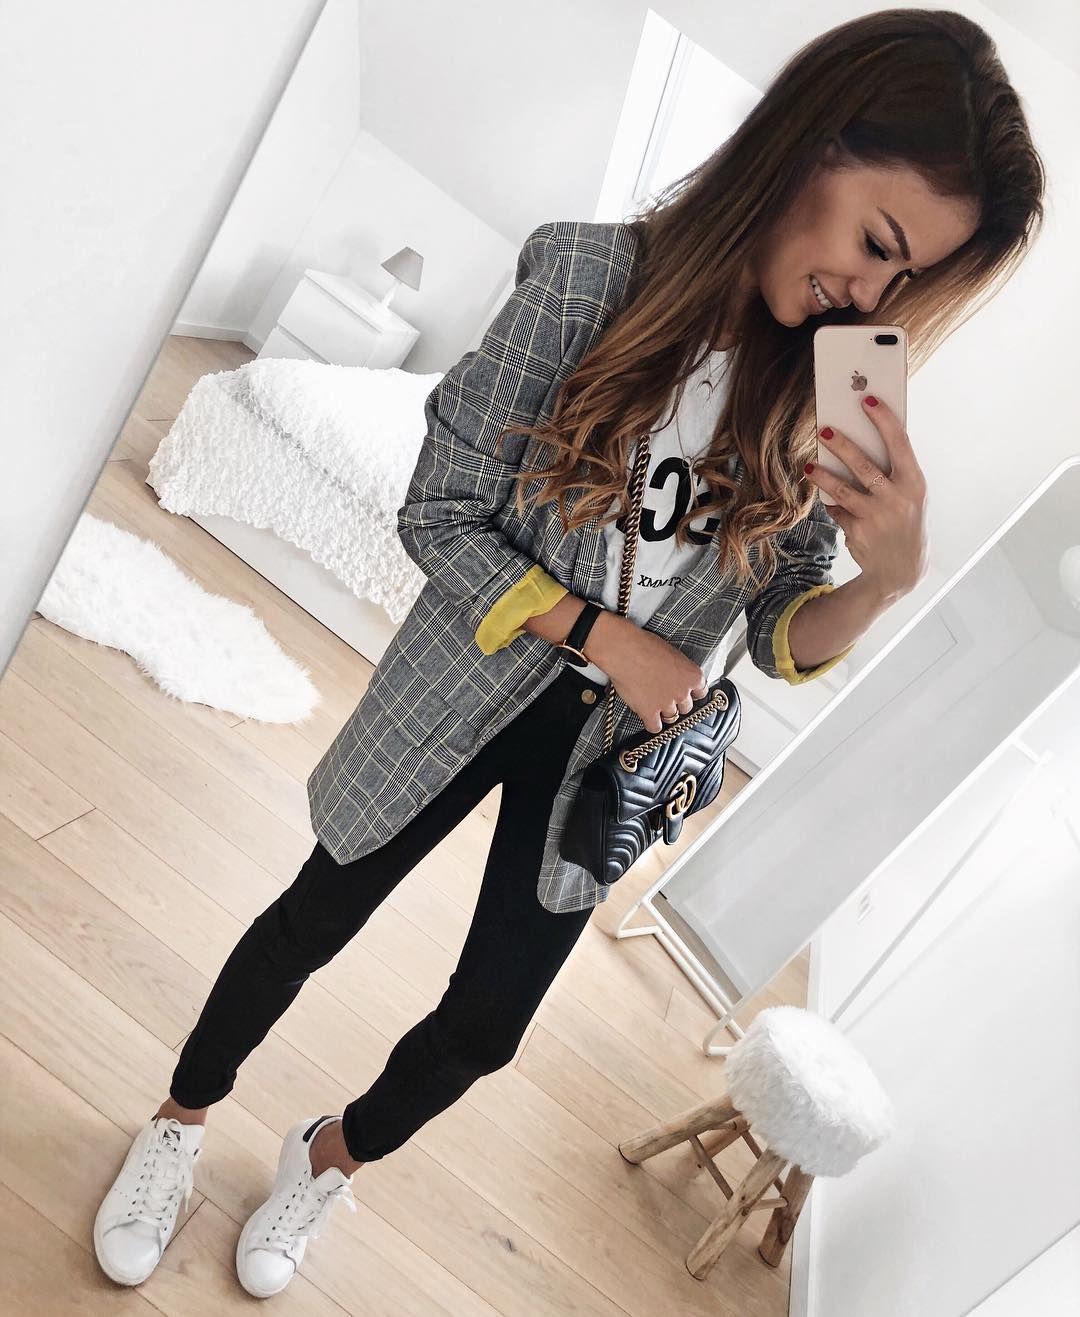 "FASHIONPUGLADY BY JAQUELINE on Instagram: ""Good morning 🤗 I wish you a great week ❤️ #outfit #outfitinspiration #dailylook #dailyoutfit #blazer #blazerlove #seamlessfashion"""